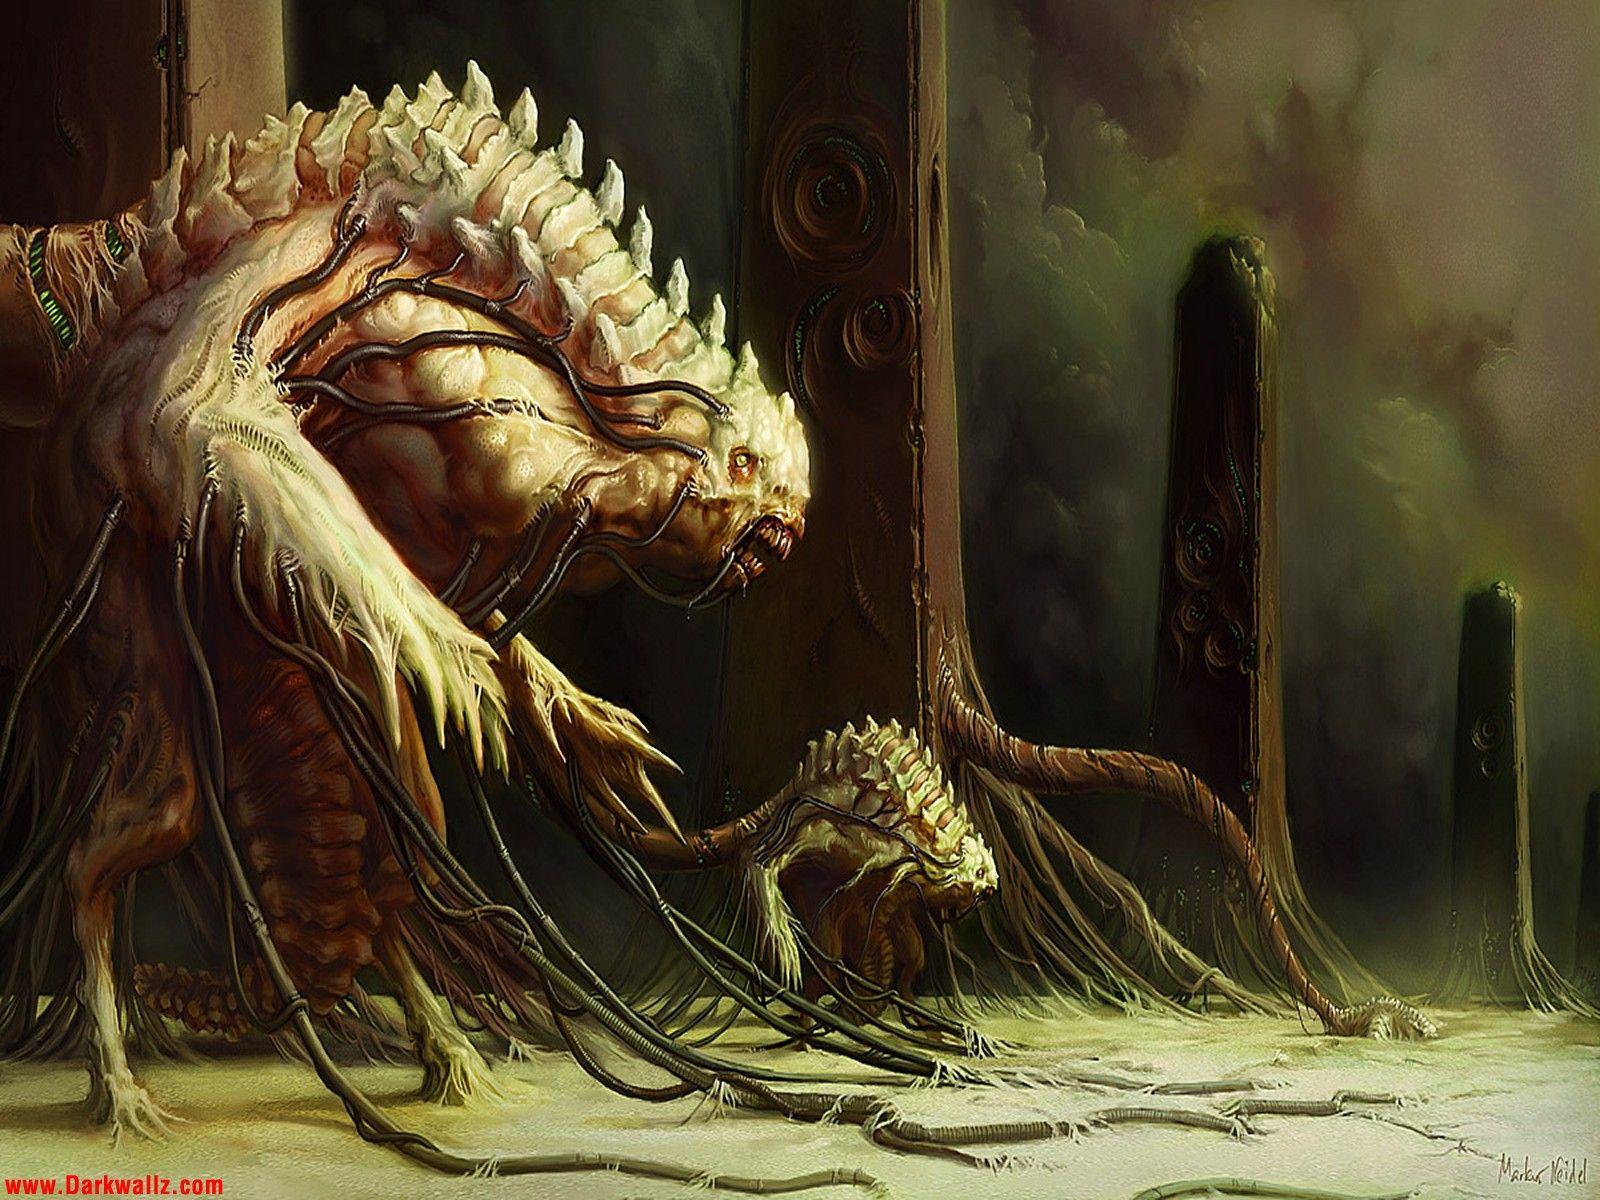 Scary Creepy Monsters Monster Wallpapers 42 Dark Wallpaper